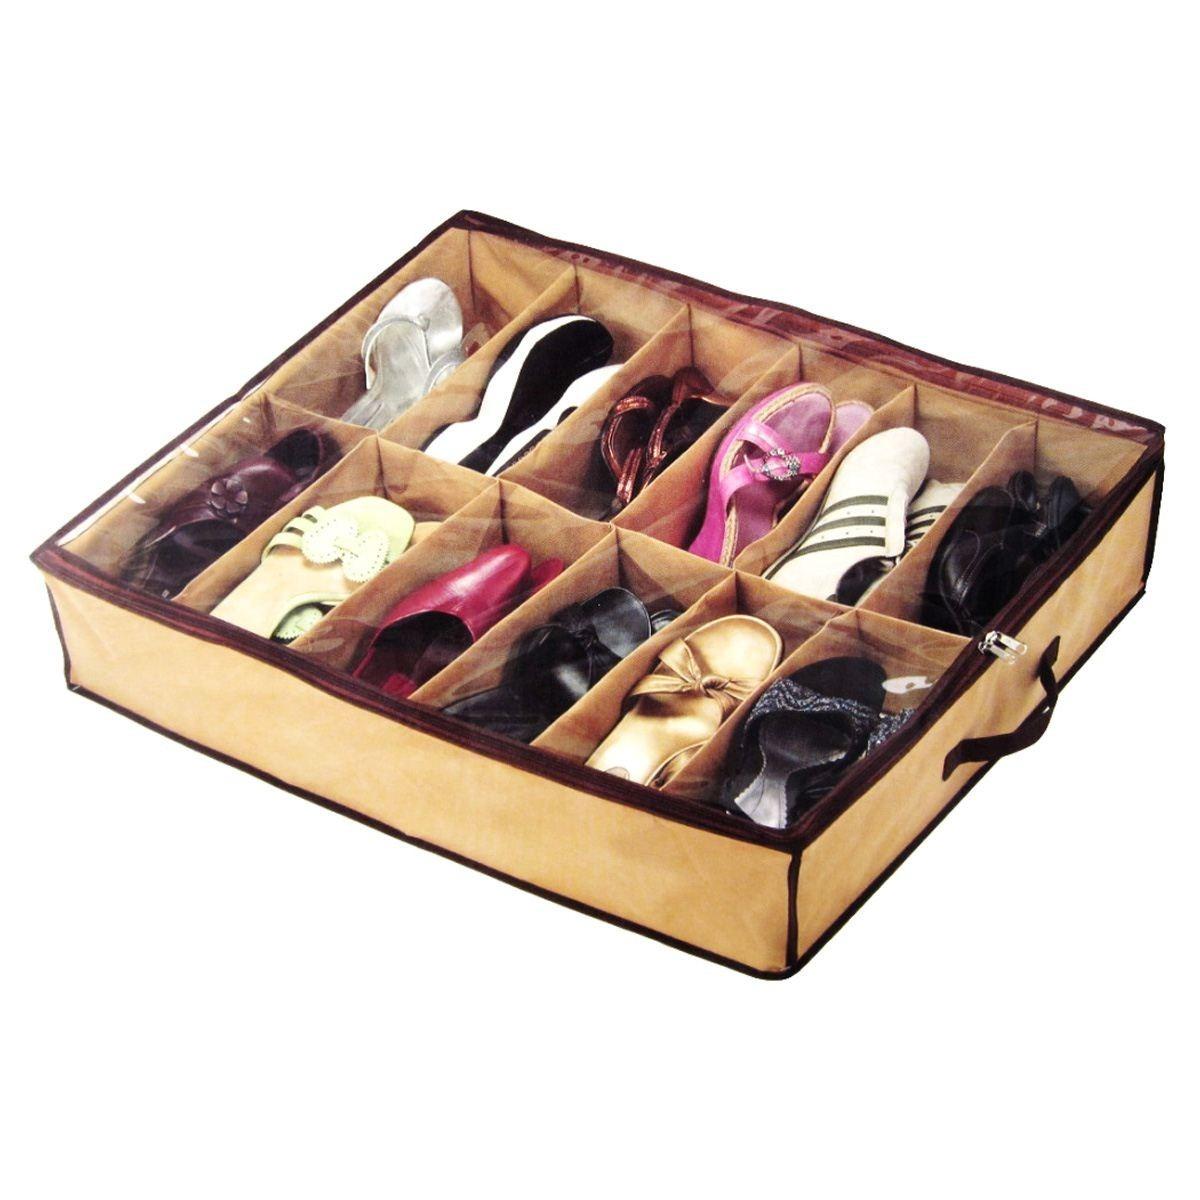 Organizador de zapatos shoes under 12 pares en mercadolibre - Organizador de zapatos ...